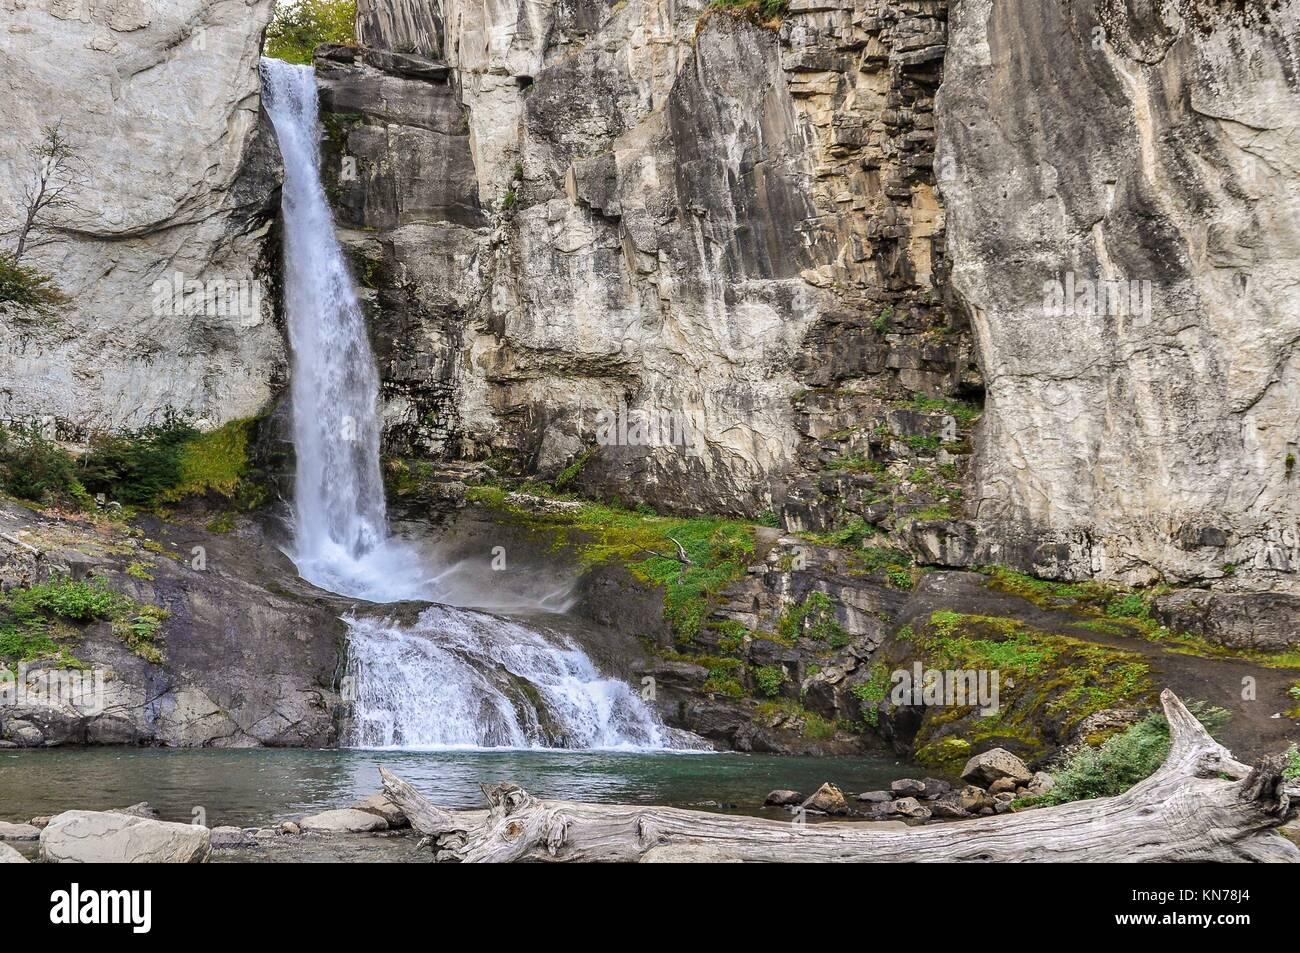 Beautiful waterfall close to El Chalten, Patagonia, Argentina. - Stock Image